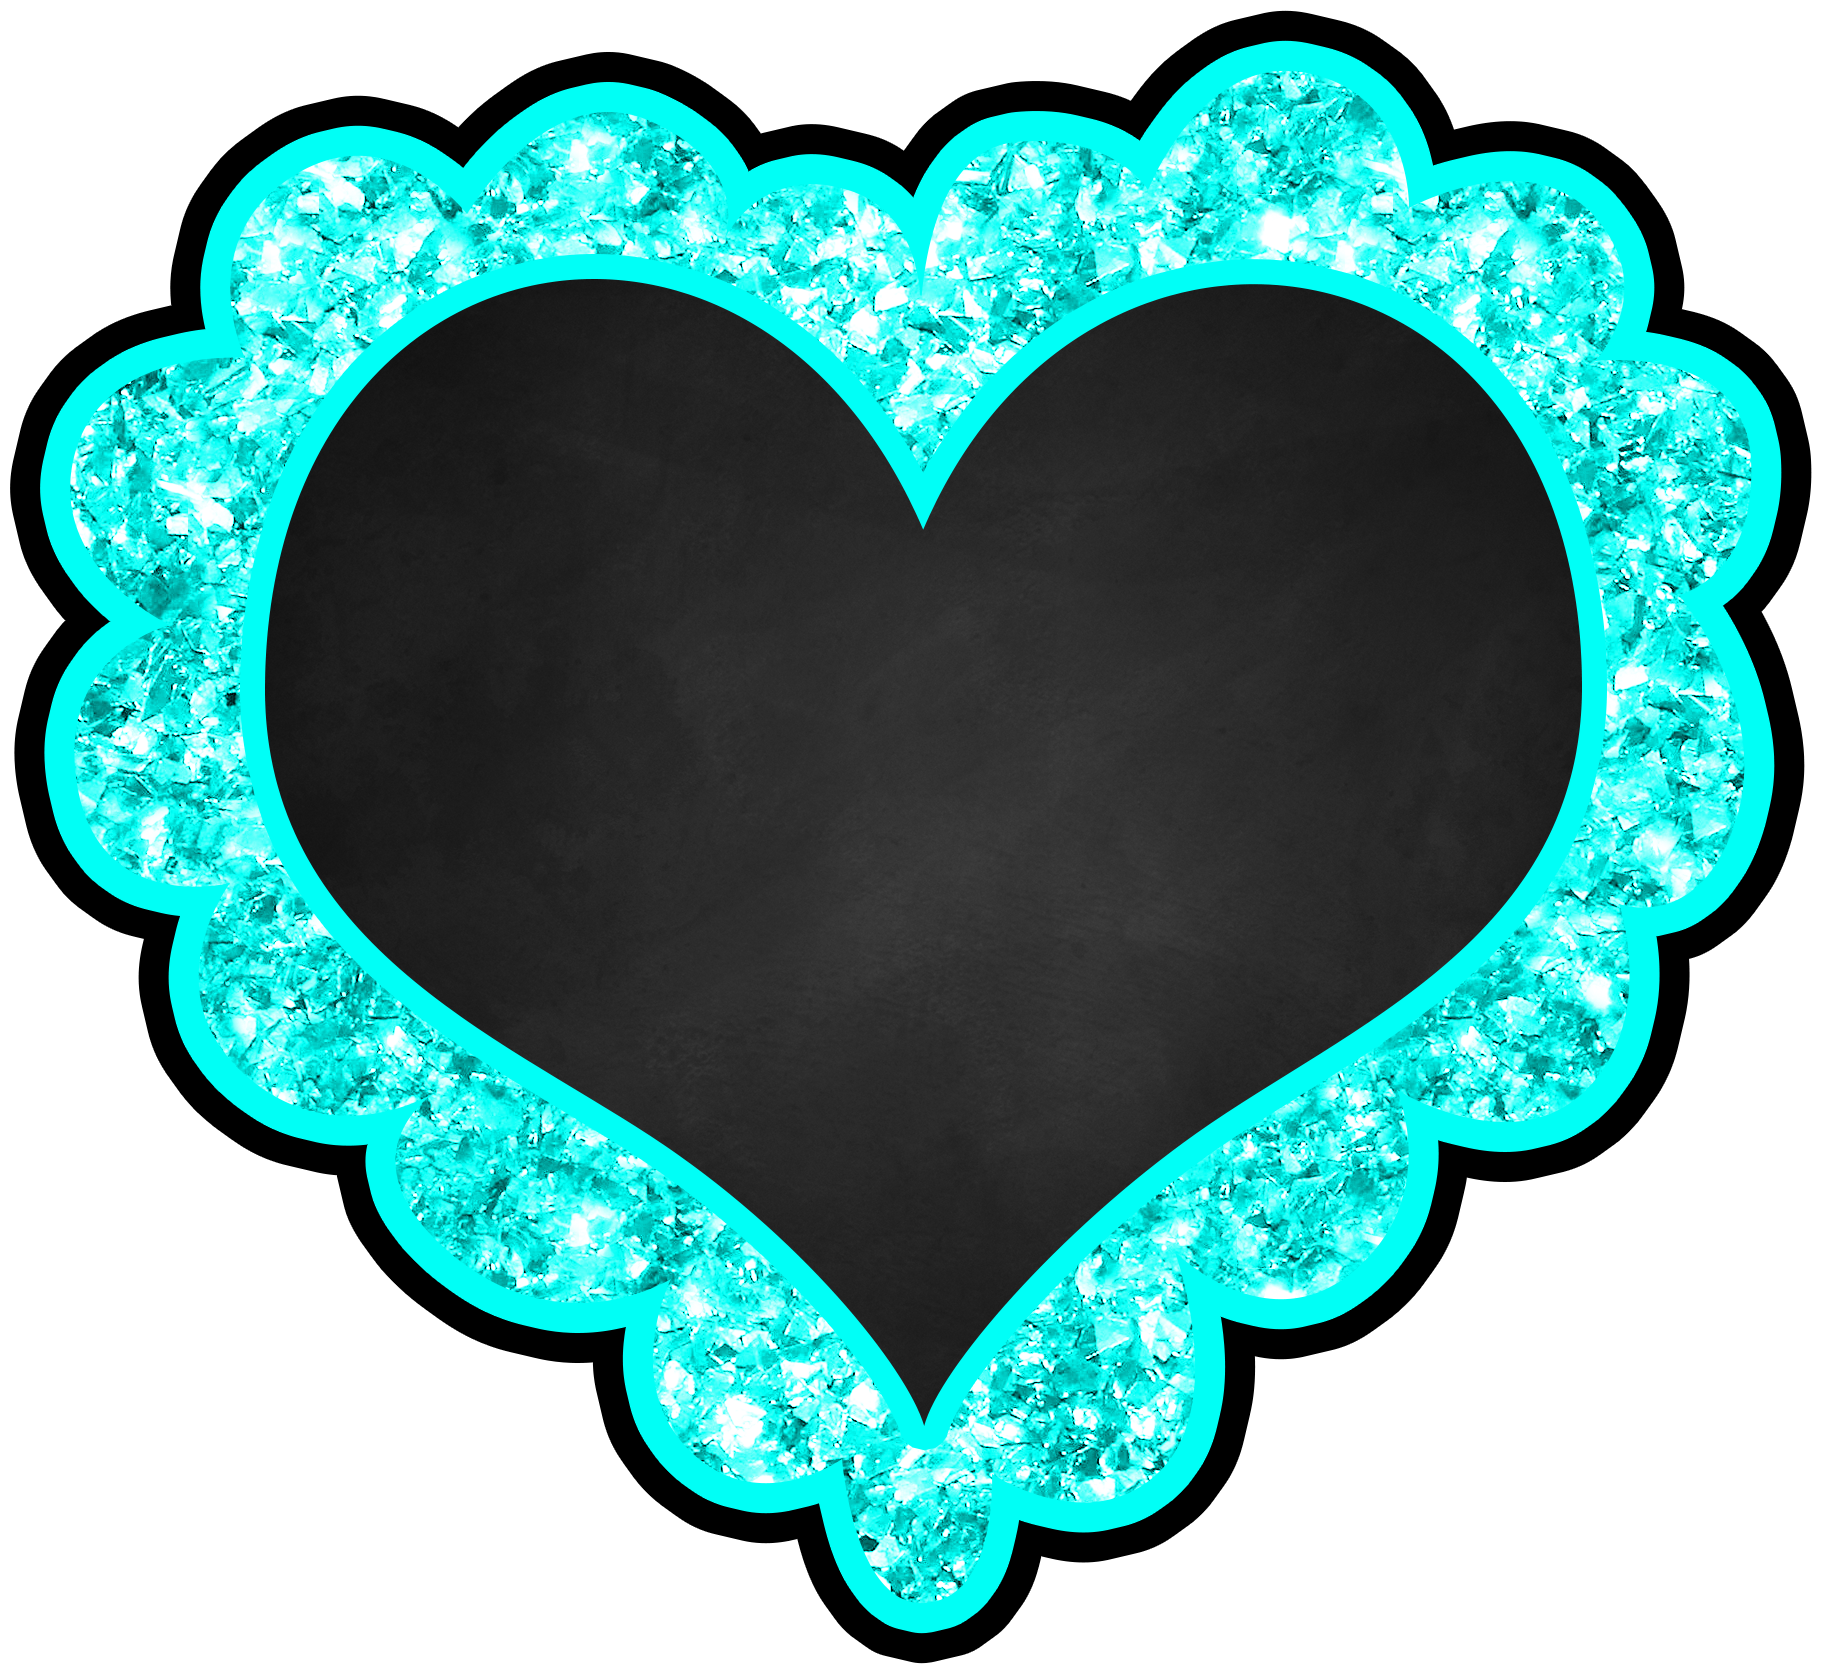 Skinny snowflake clipart free ✿**✿*CORAZONES*✿**✿* | Corazon Mio 1 | Pinterest | Clip art and ... free